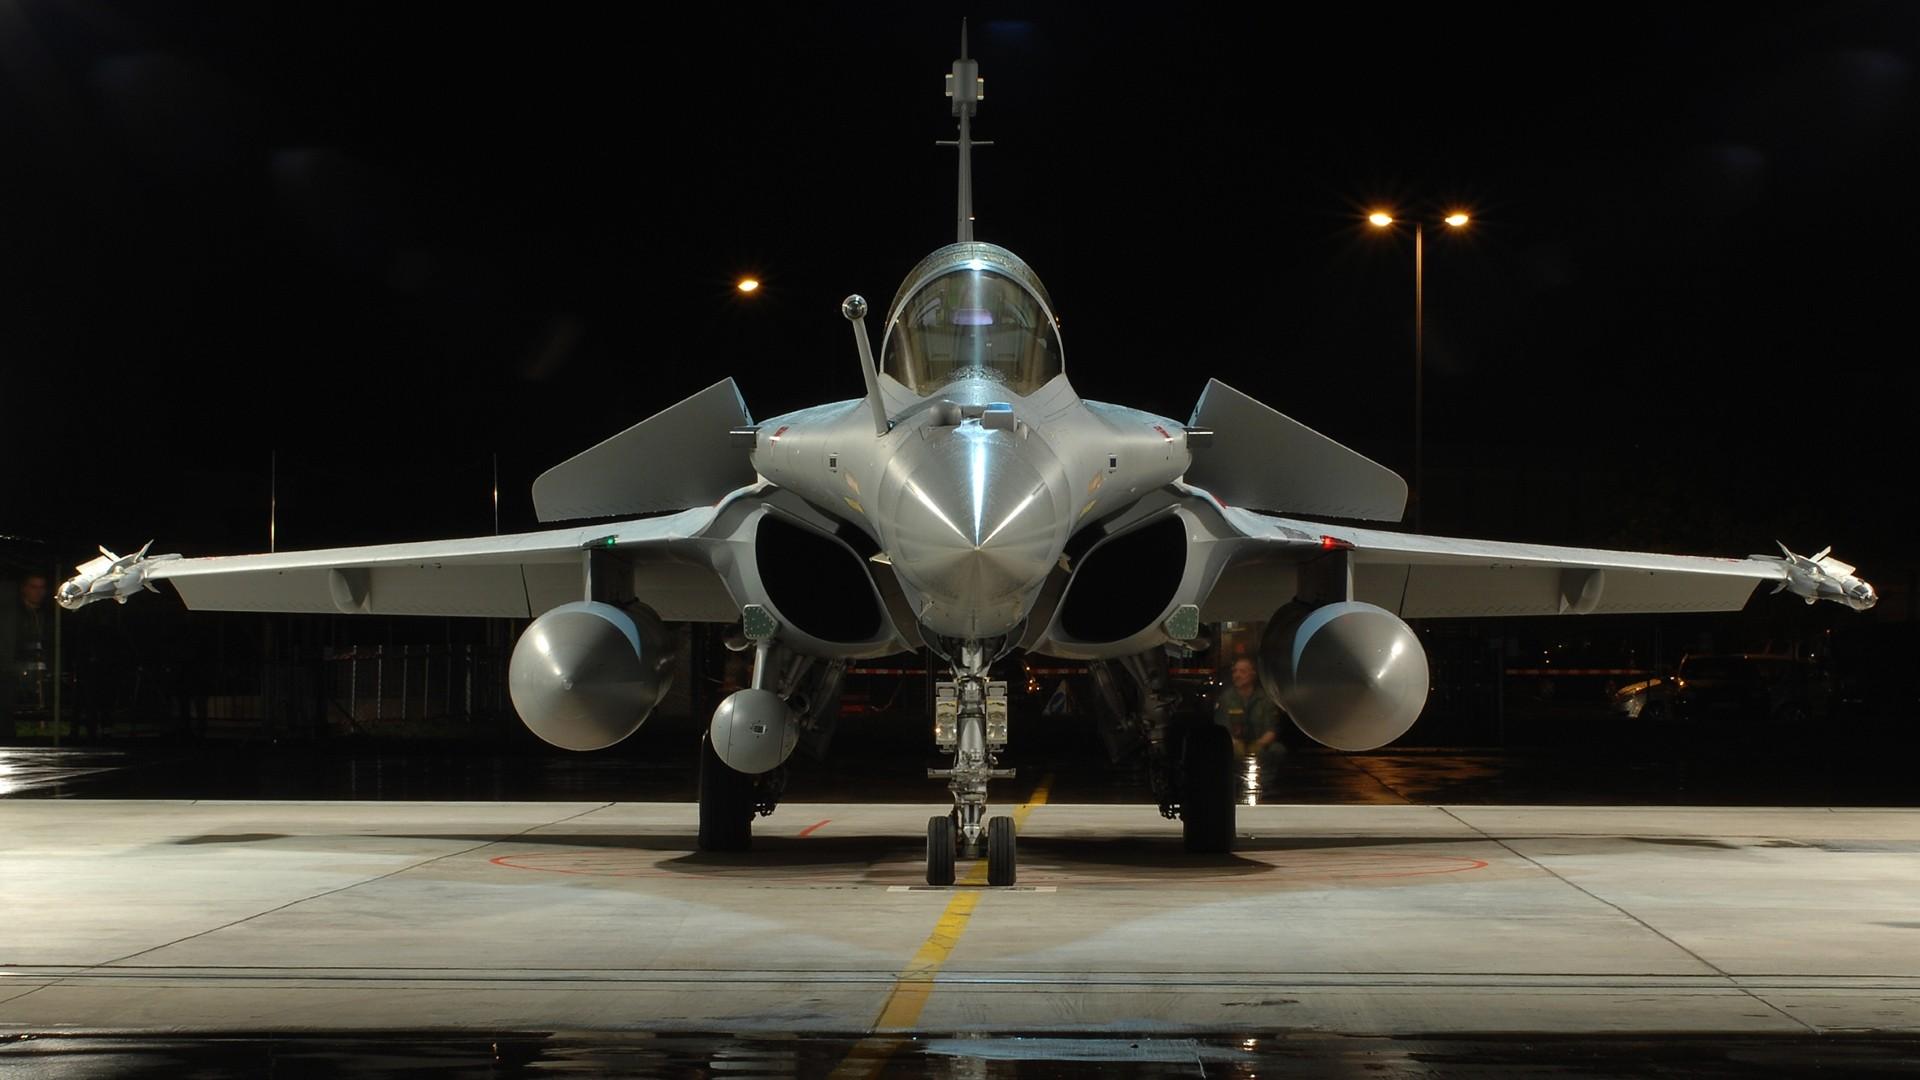 Fondos De Pantalla 1920x1080 Px Dassault Rafale Militar